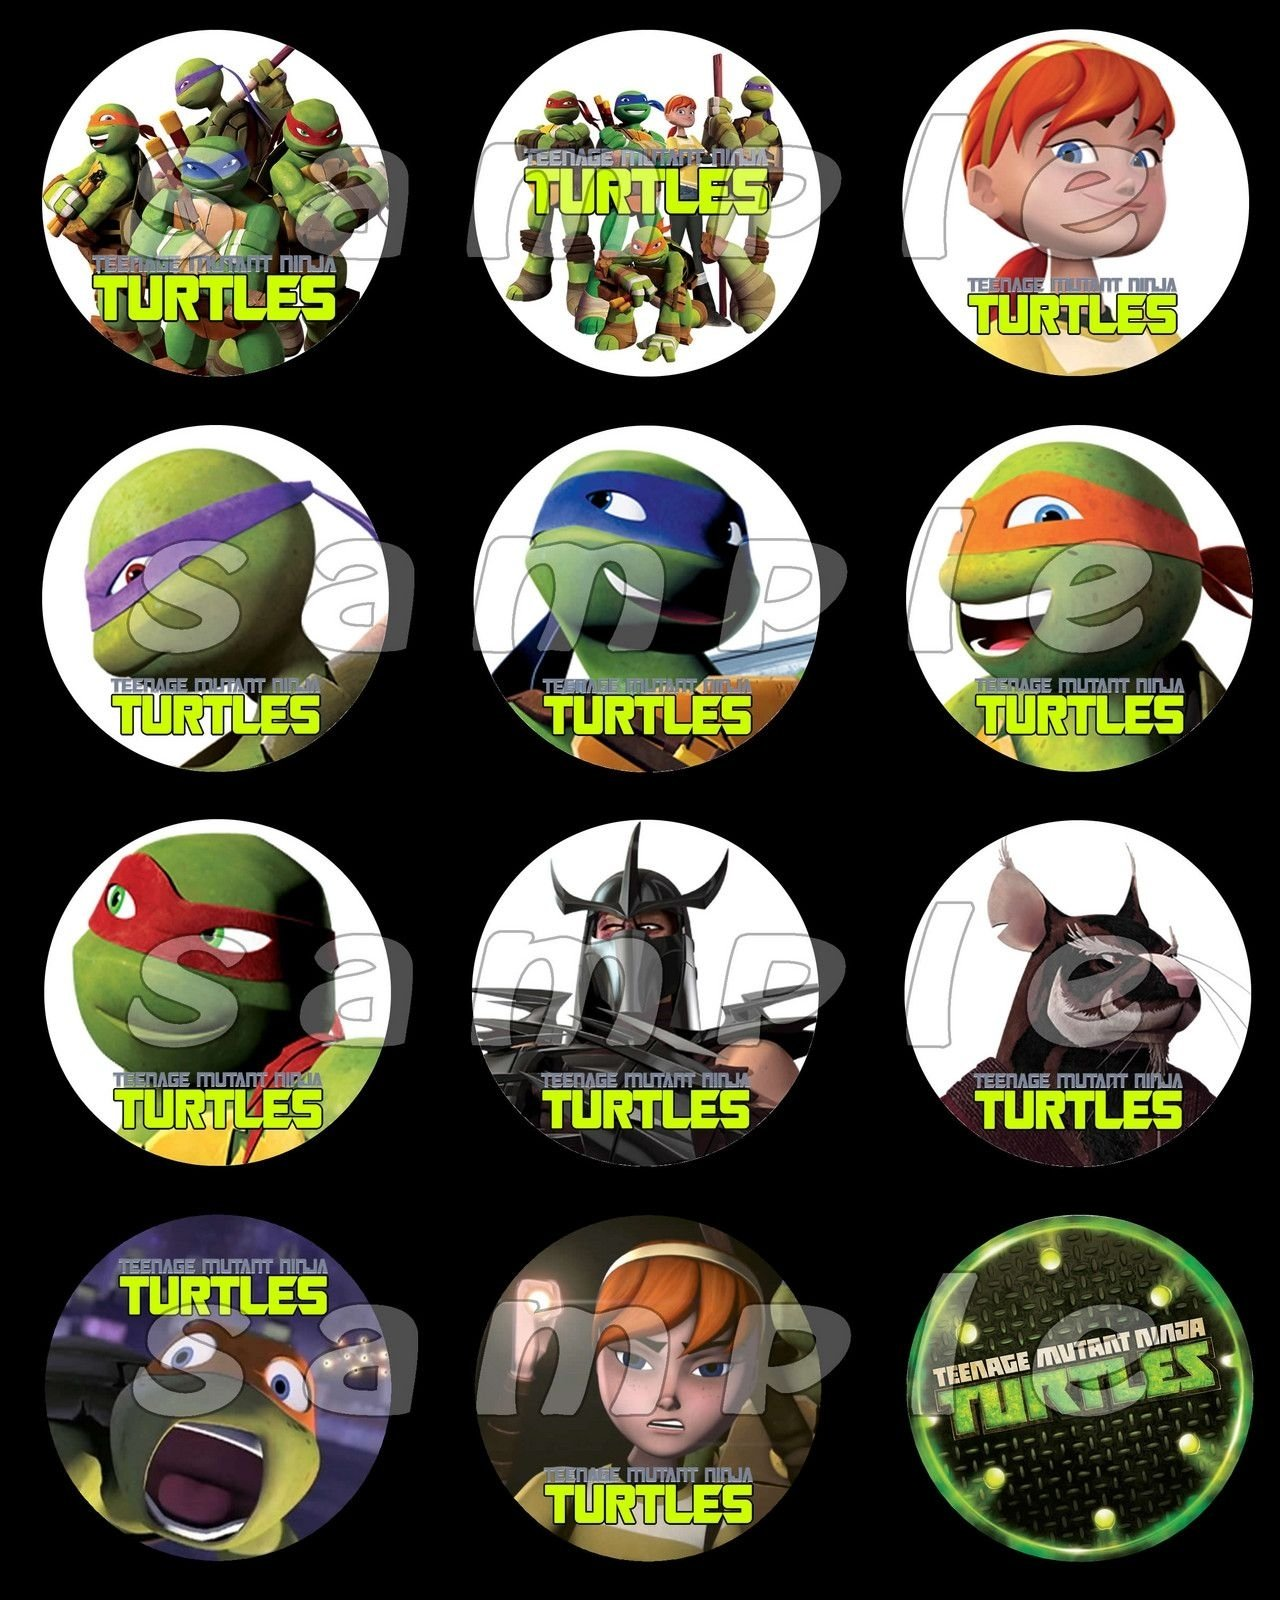 10 Attractive Teenage Mutant Ninja Turtles Cupcake Ideas teenage mutant ninja turtles stickers cupcake toppers 3 00